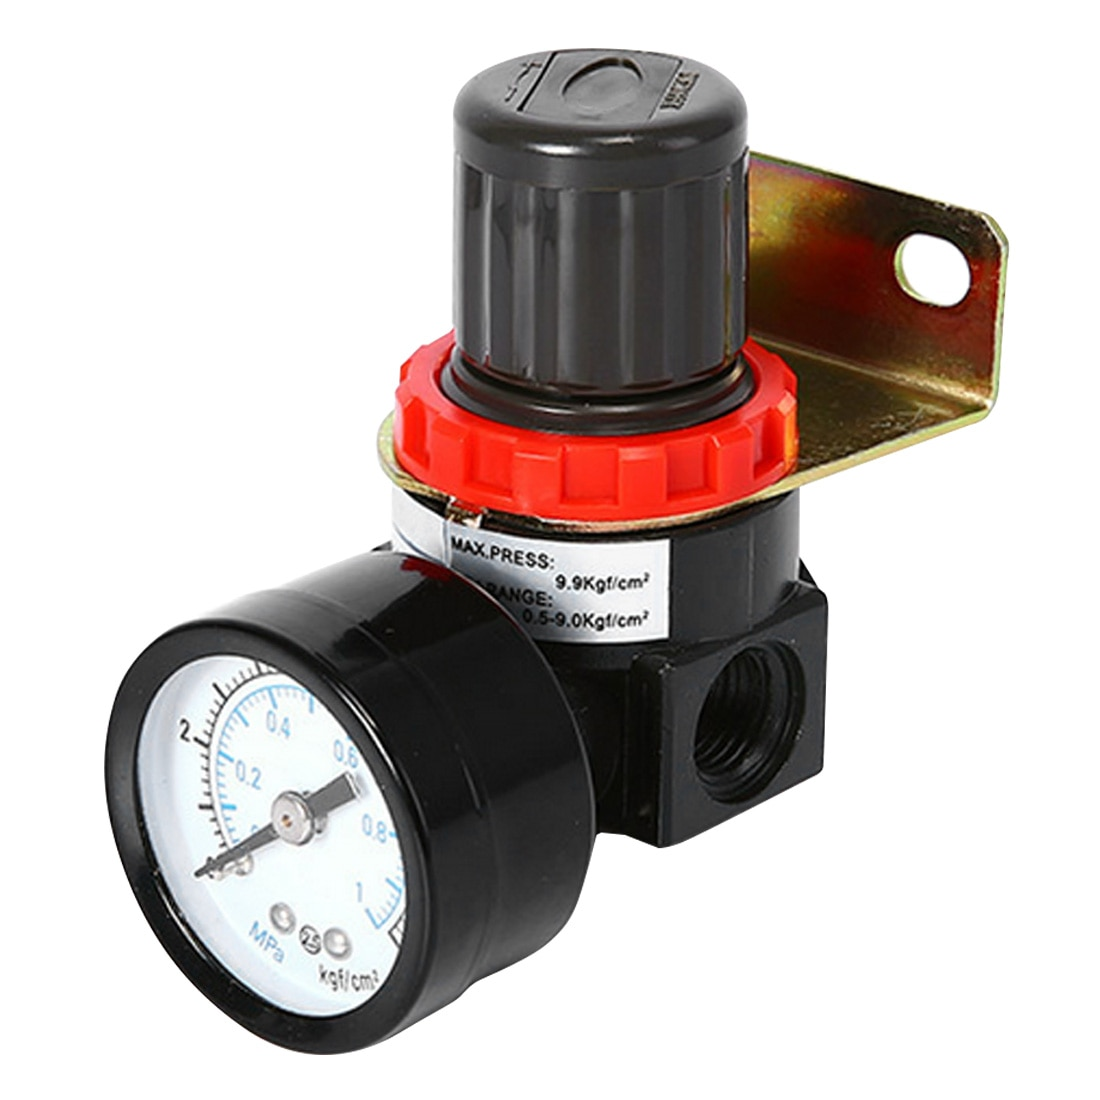 Pressure Relief Regulator Valve with Fitting AR2000 G1/4'' 12mm Regulator Valve Pressure Regulator Valve  Air Control Compressor